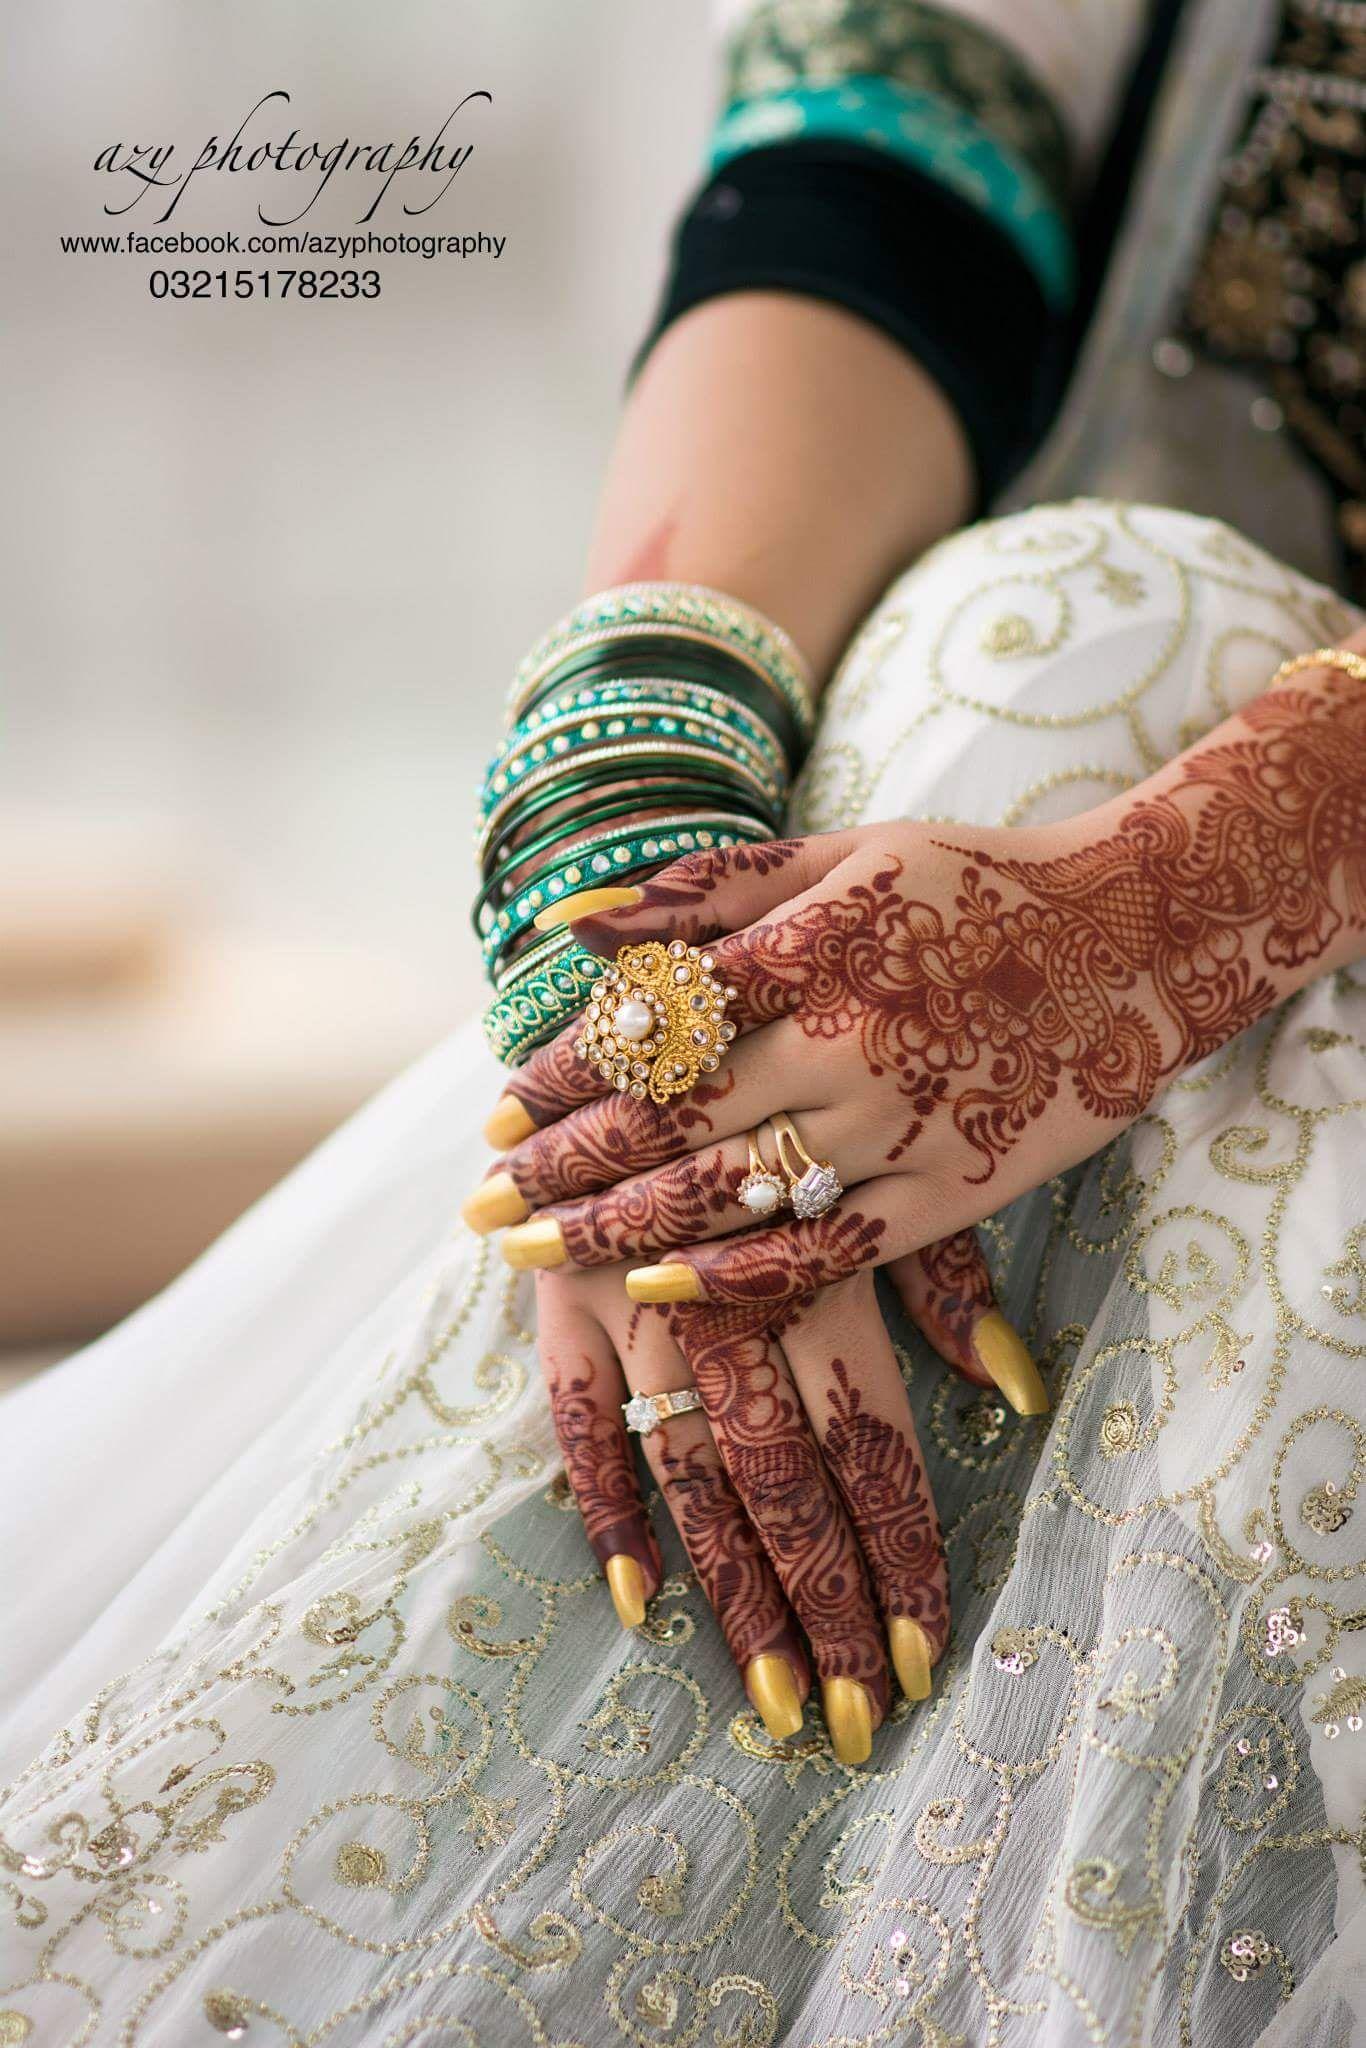 Beautiful hands Azy Khan photography | Beautiful Bridal hands ...